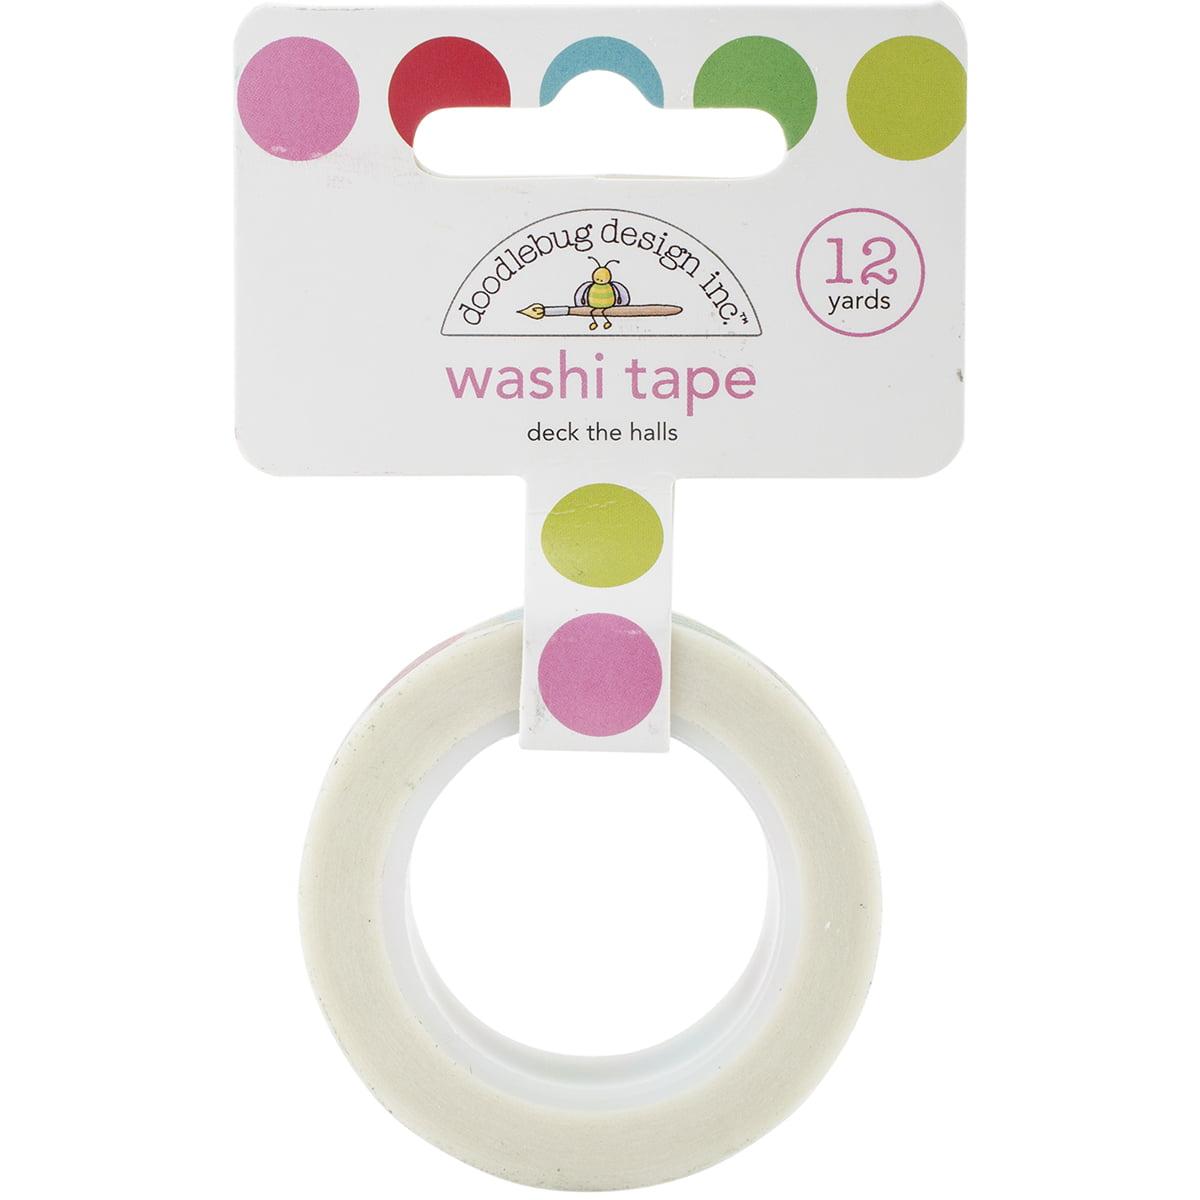 Doodlebug Washi Tape 15mm X 12yd-Sugarplums Deck The Halls